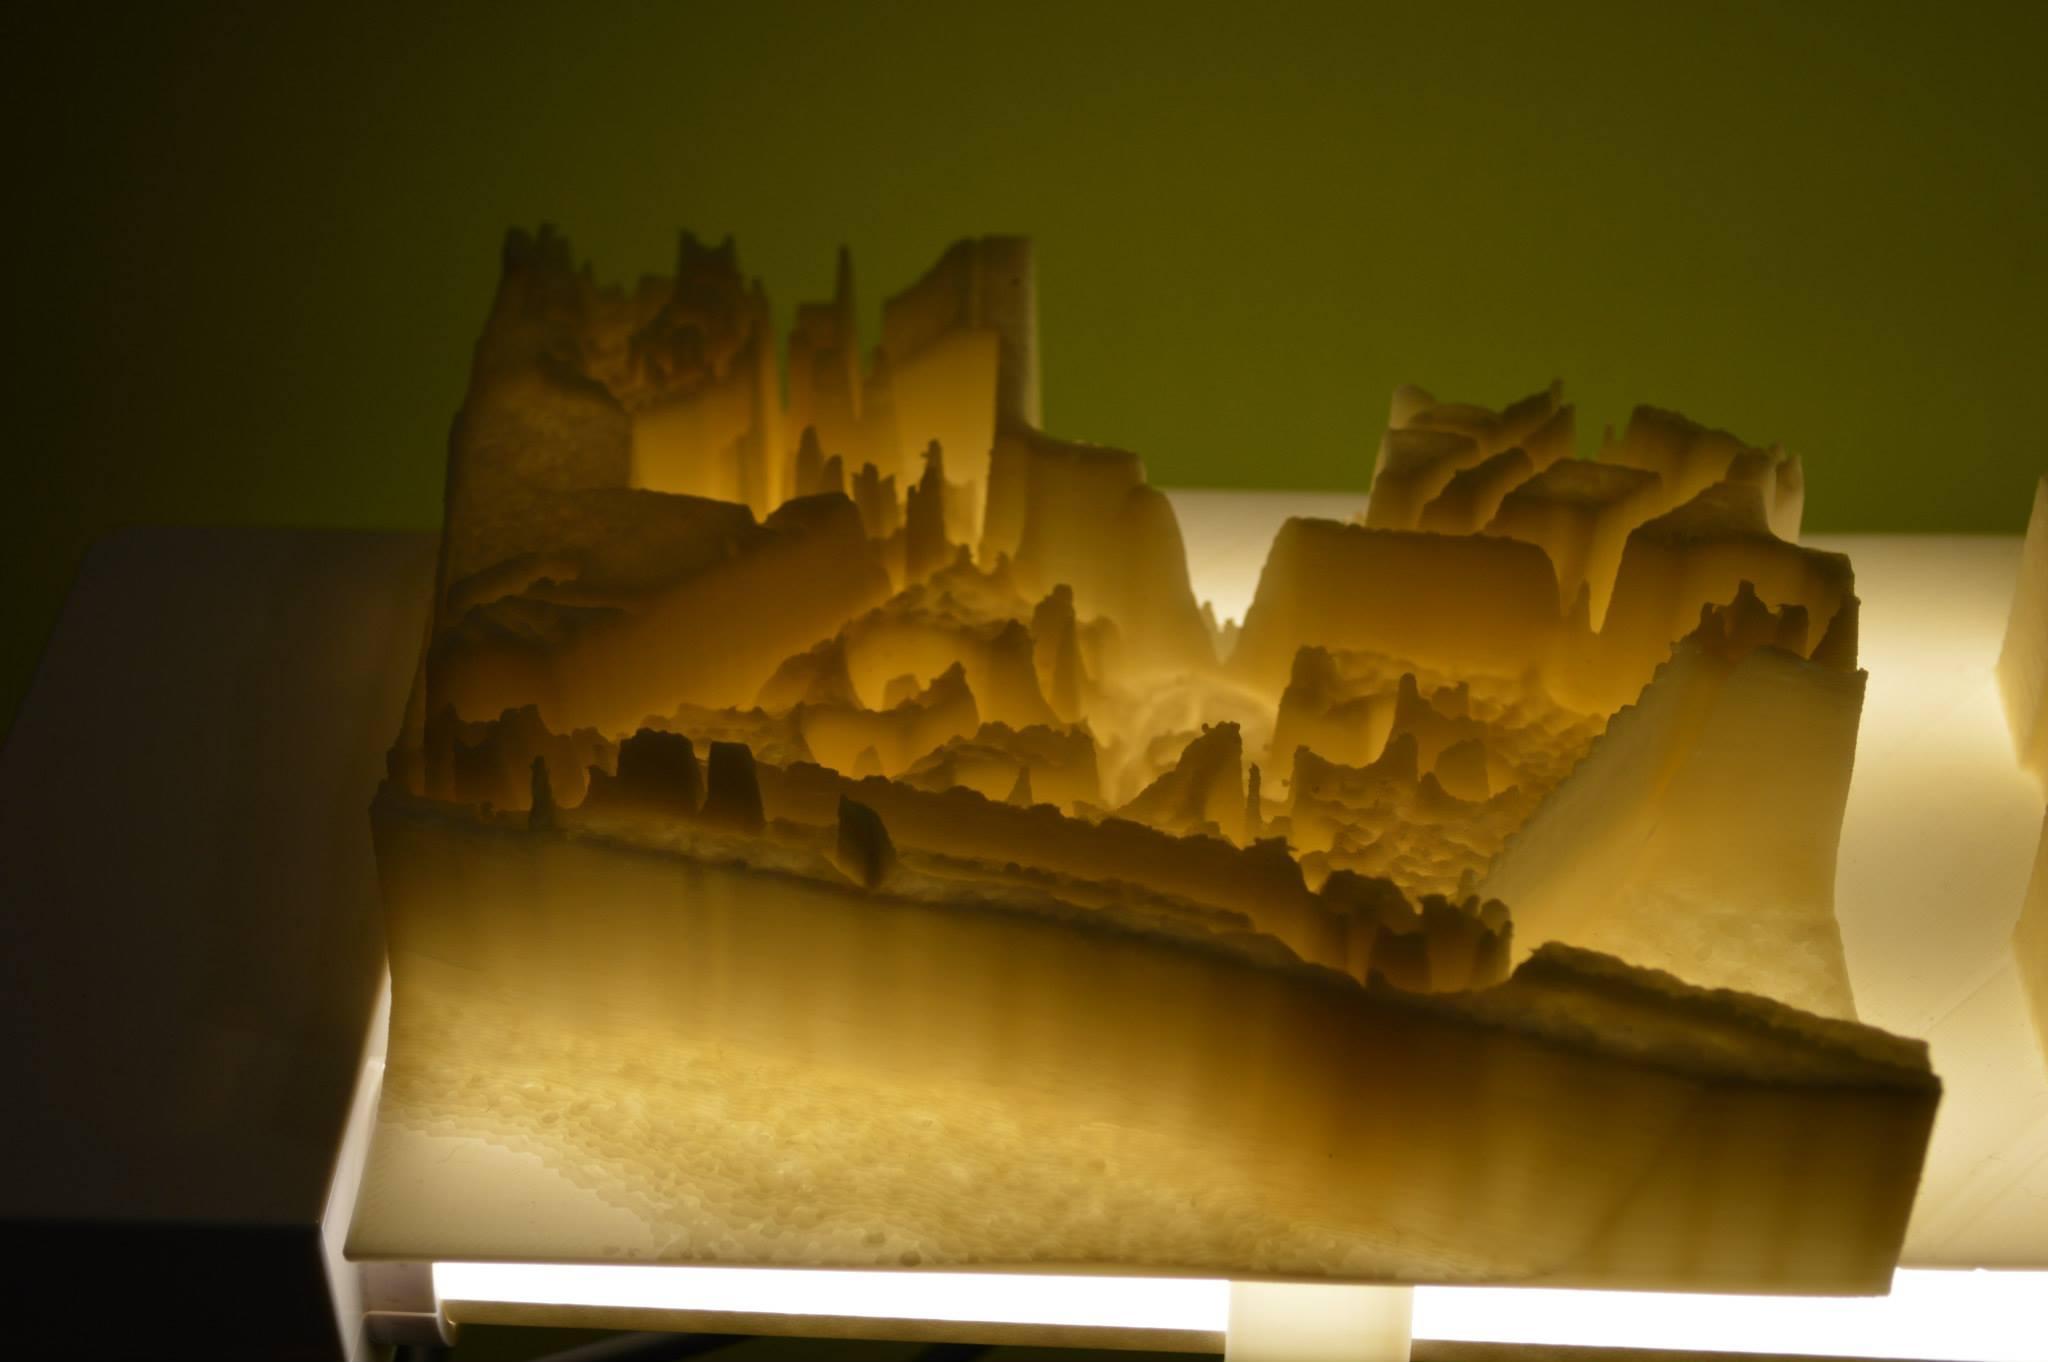 LulzBots Amazingly Thick 3D Printed Lithophanes Stun